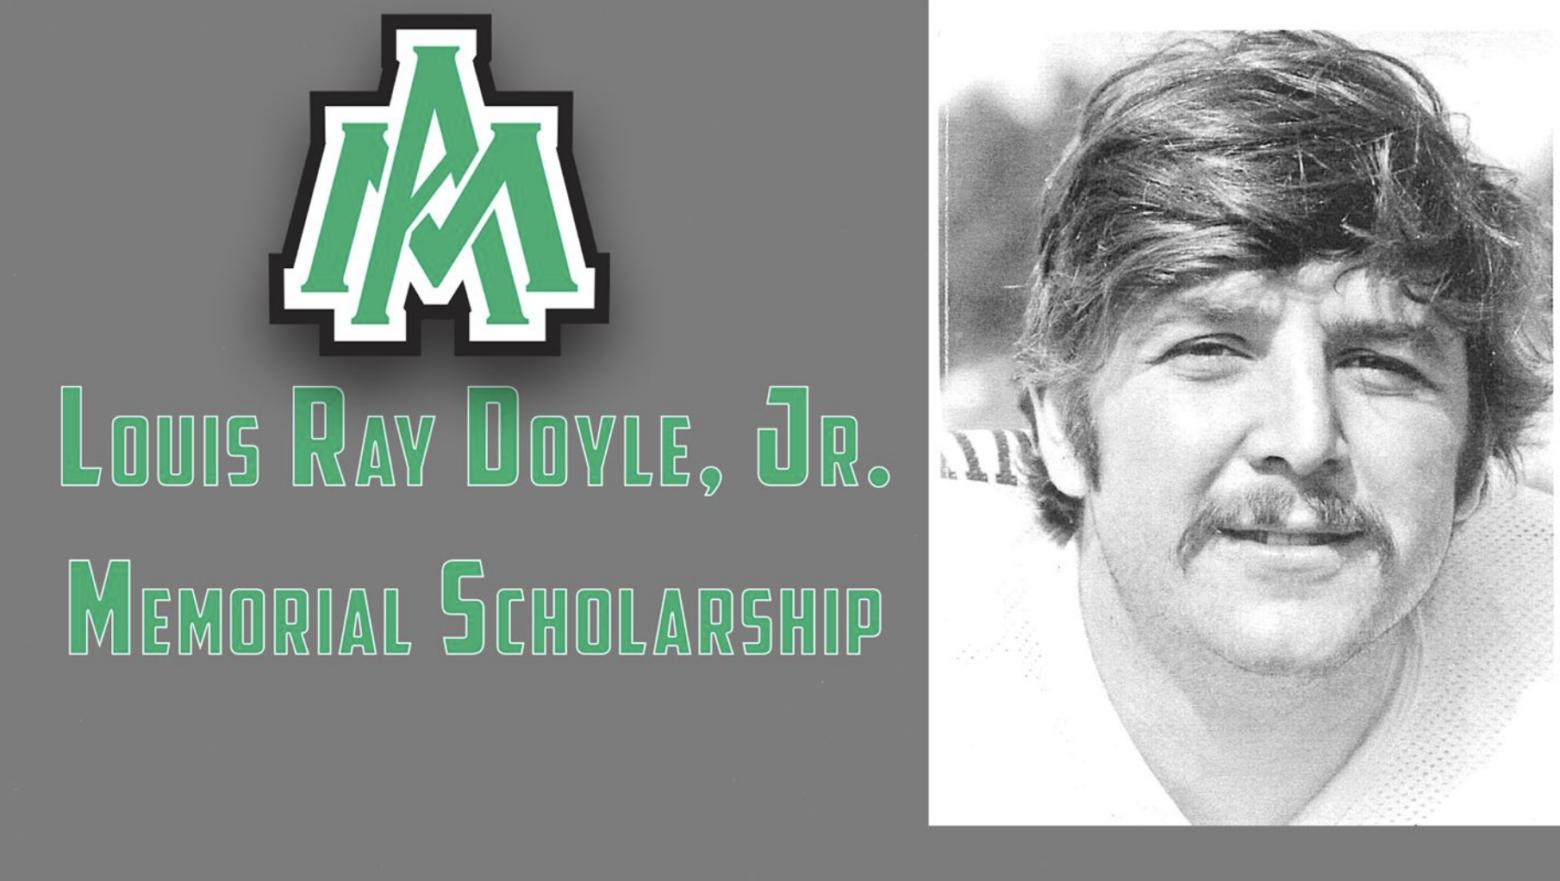 UAM announces the 1979 Champions/Ray Doyle Memorial Scholarship